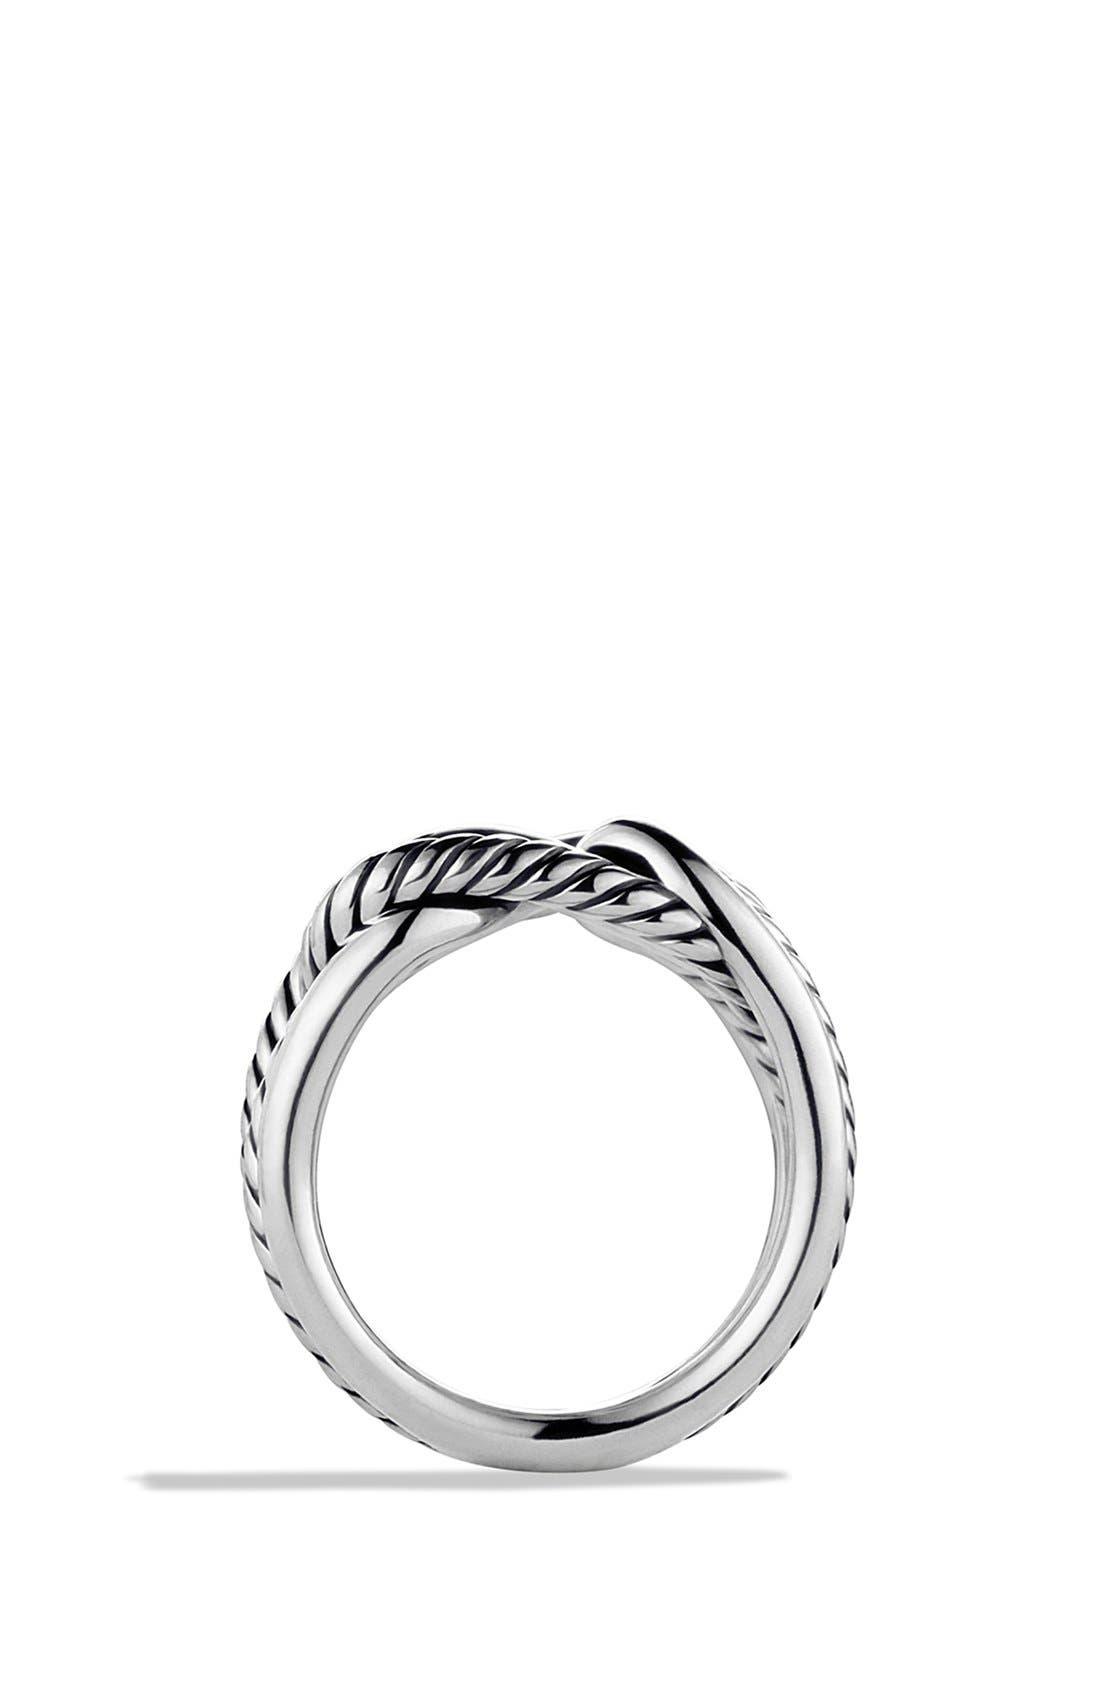 Alternate Image 3  - David Yurman 'Labyrinth' Ring